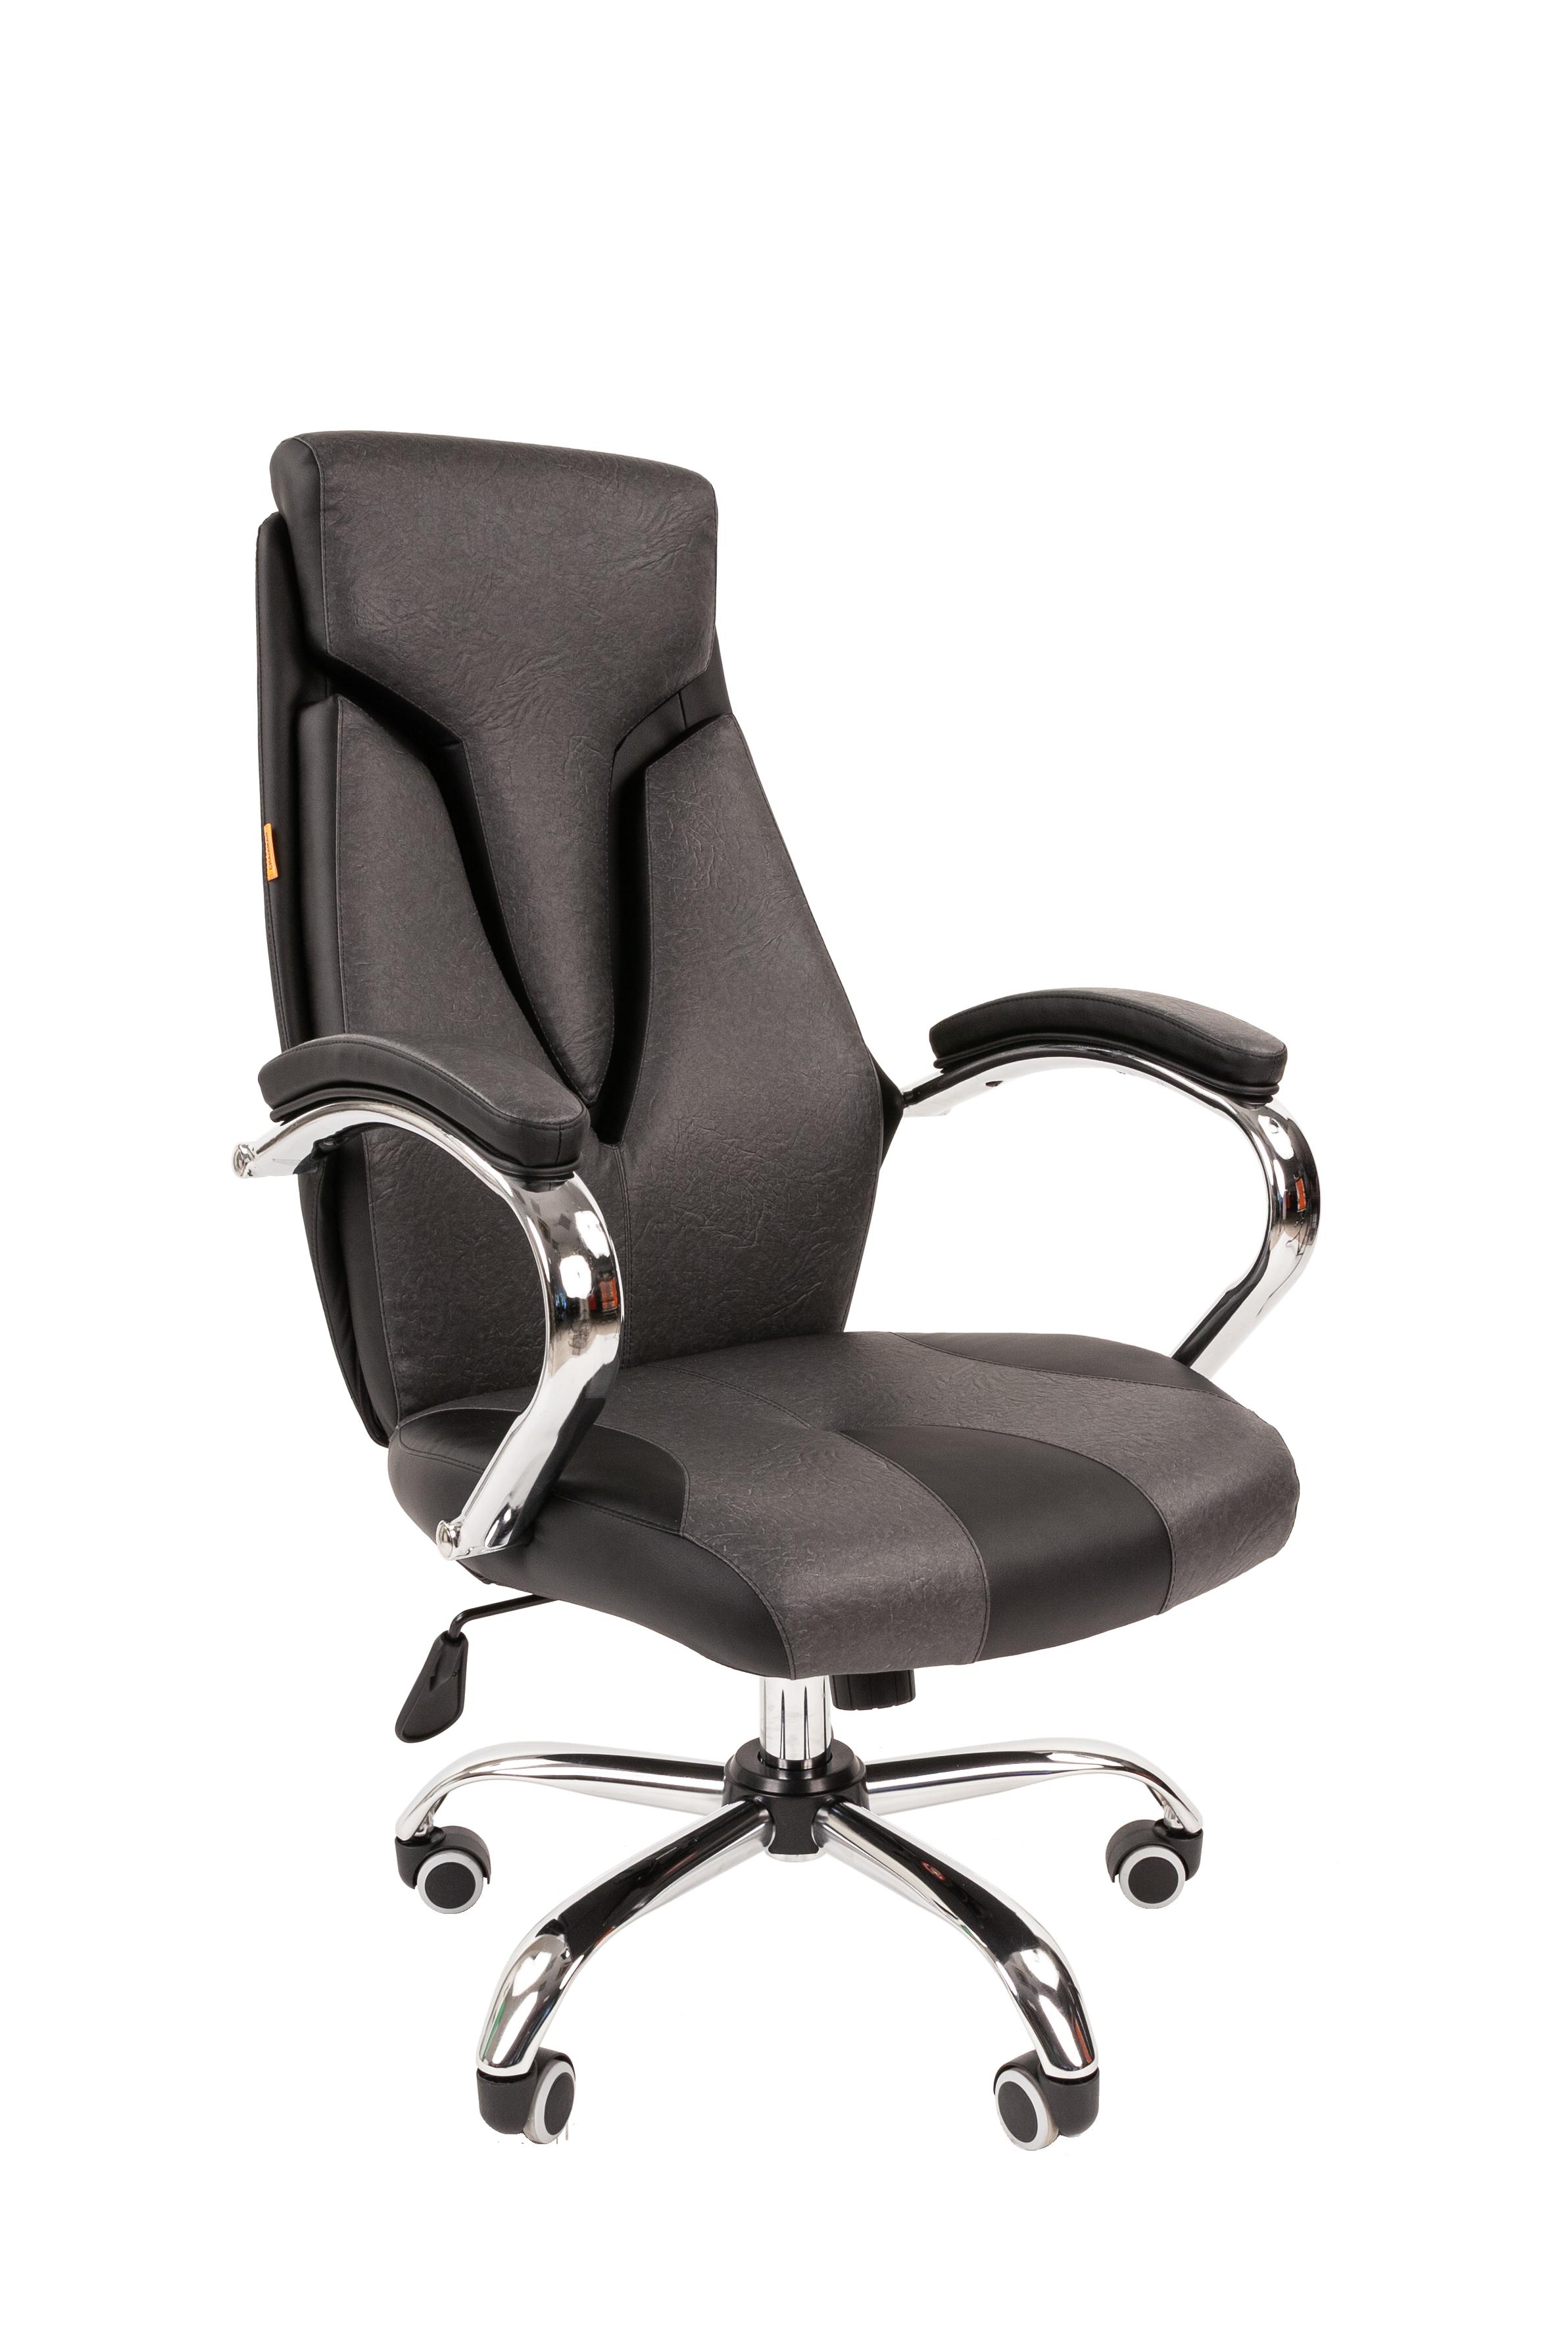 Кресло руководителя CHAIRMAN 901 7047370, серый